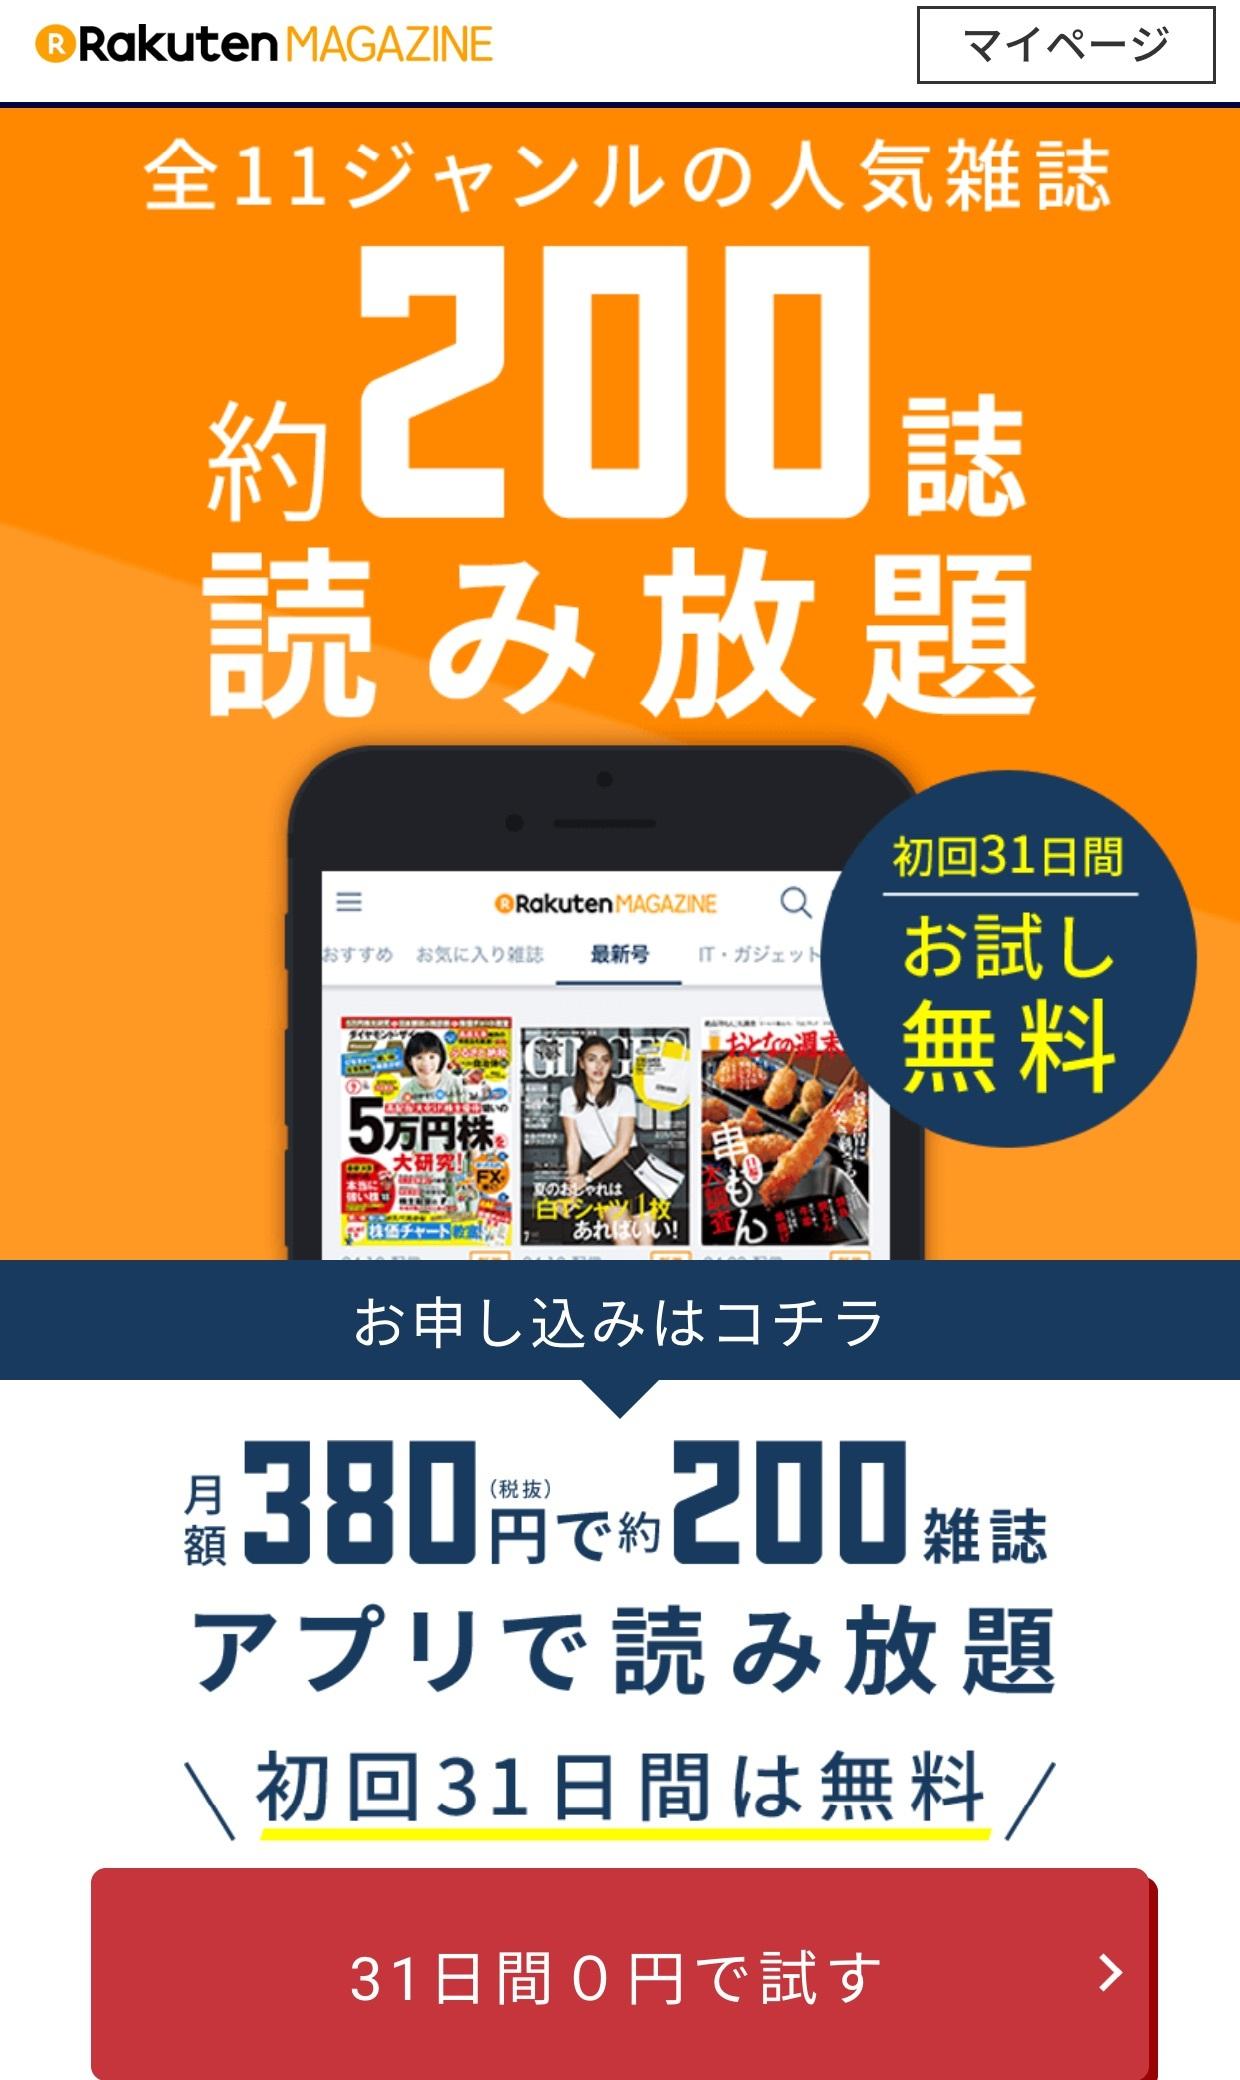 c0358651_20101843.jpg